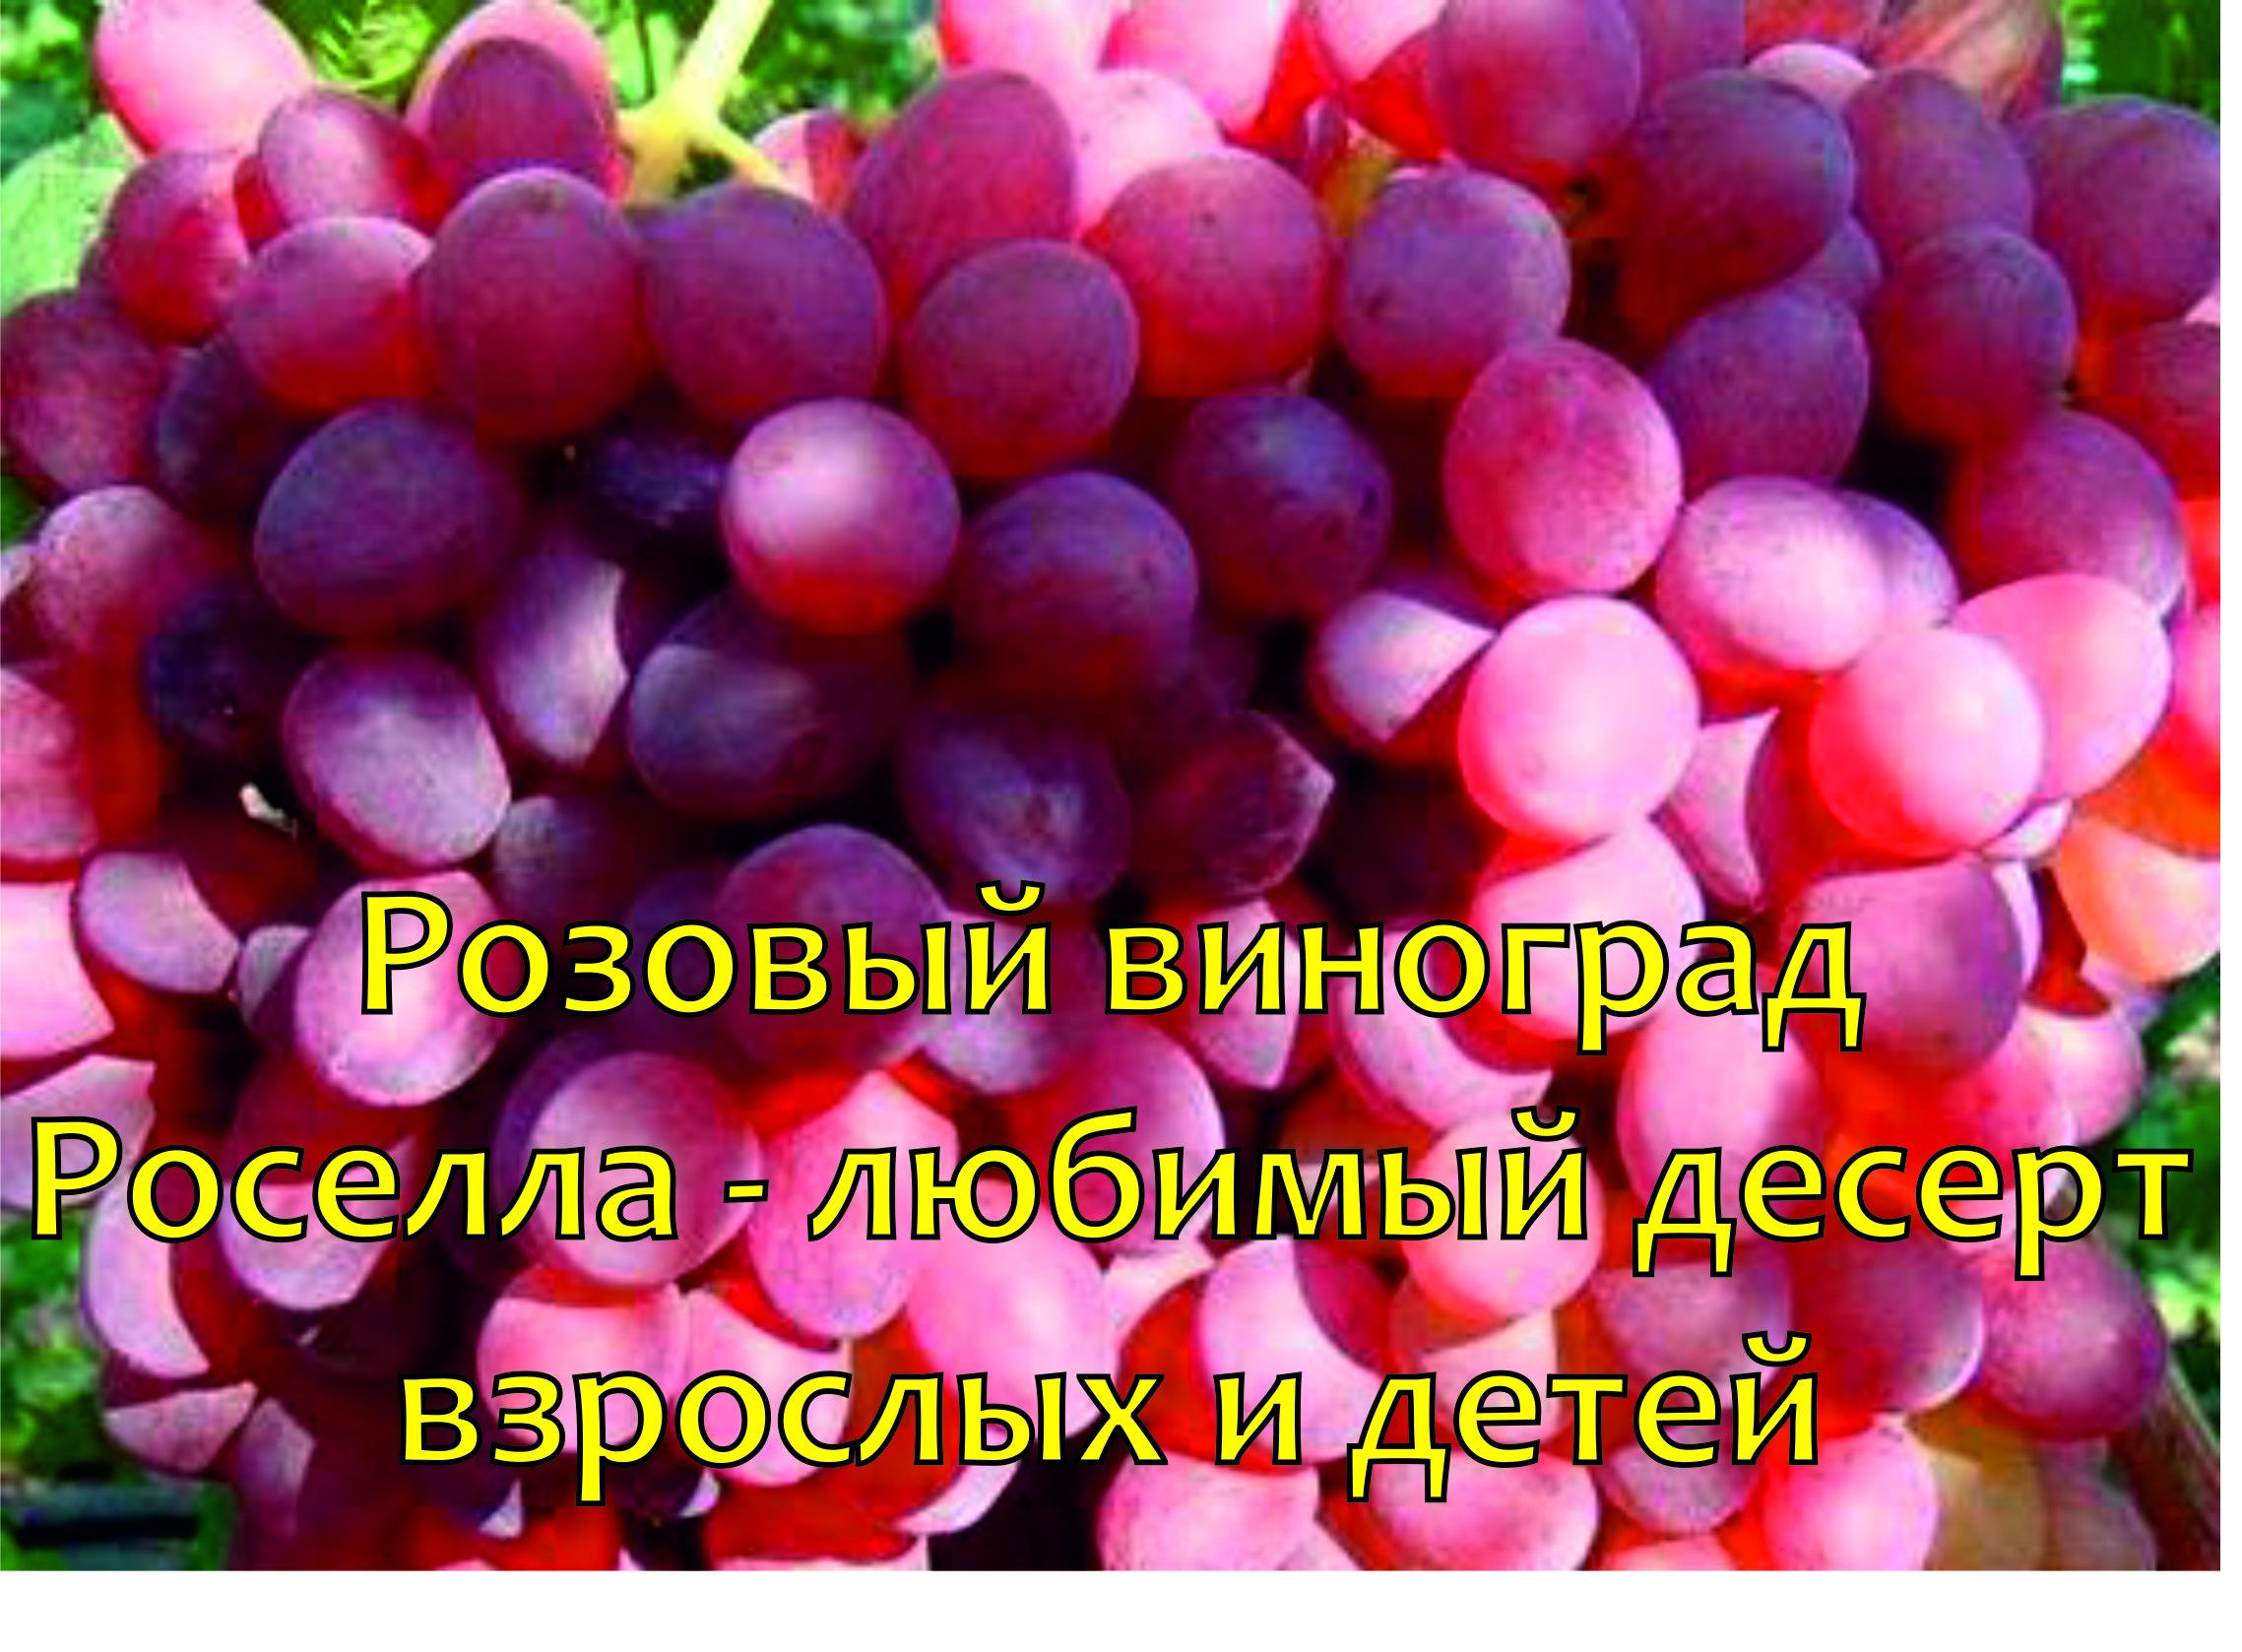 плоды винограда Роселла